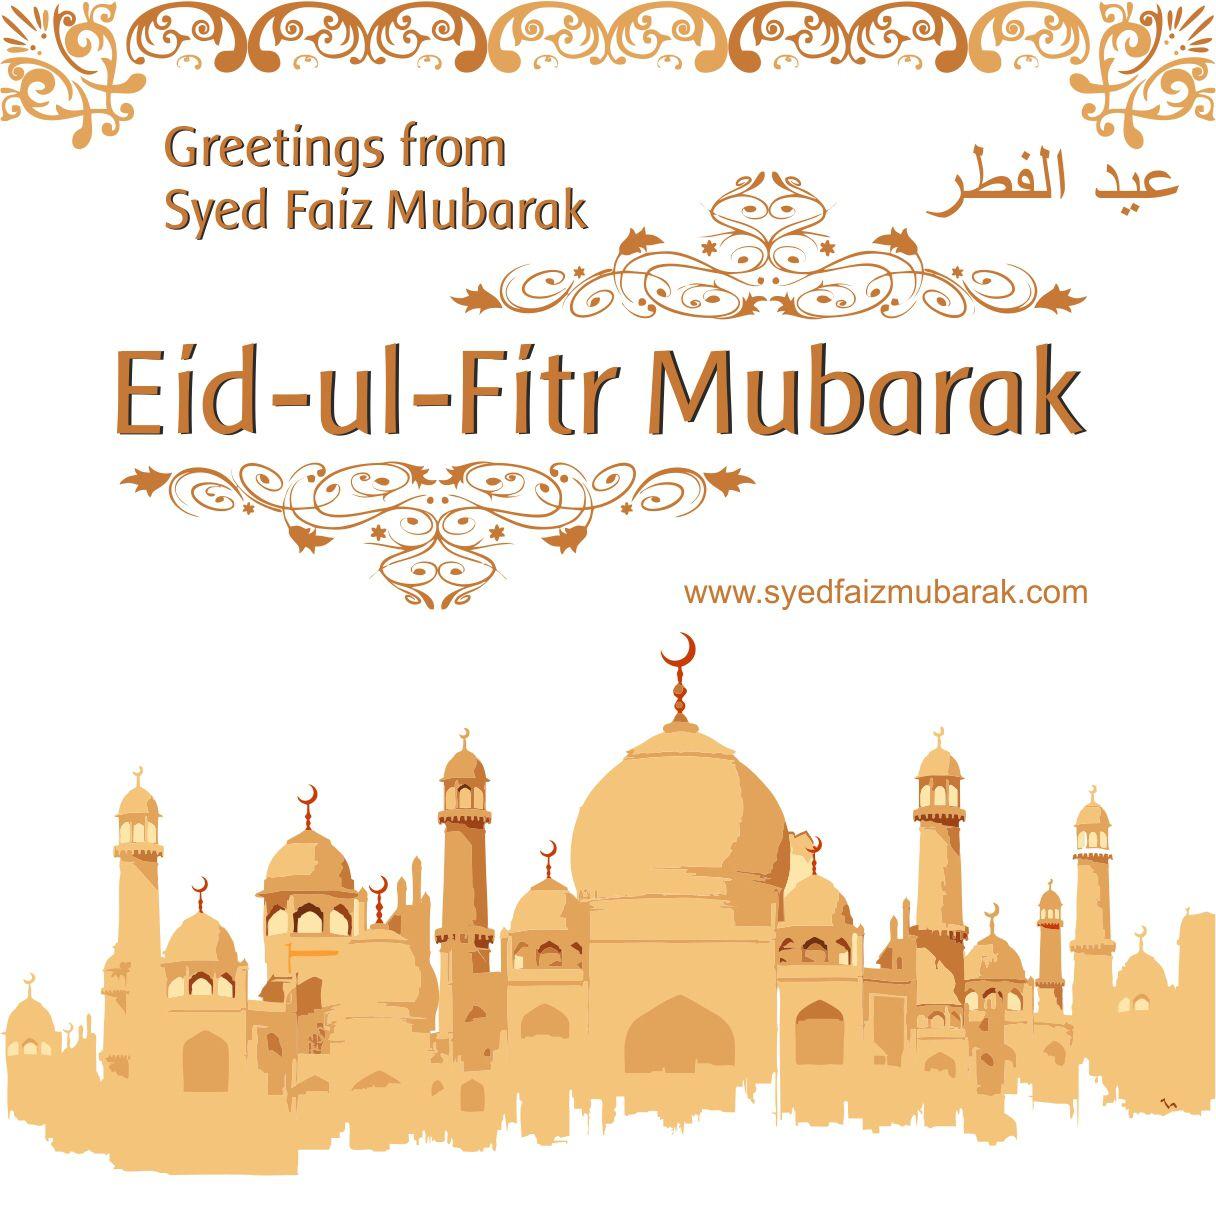 Eid Ul Fitr Mubarak Greetings Best Regards And Warm Wishes